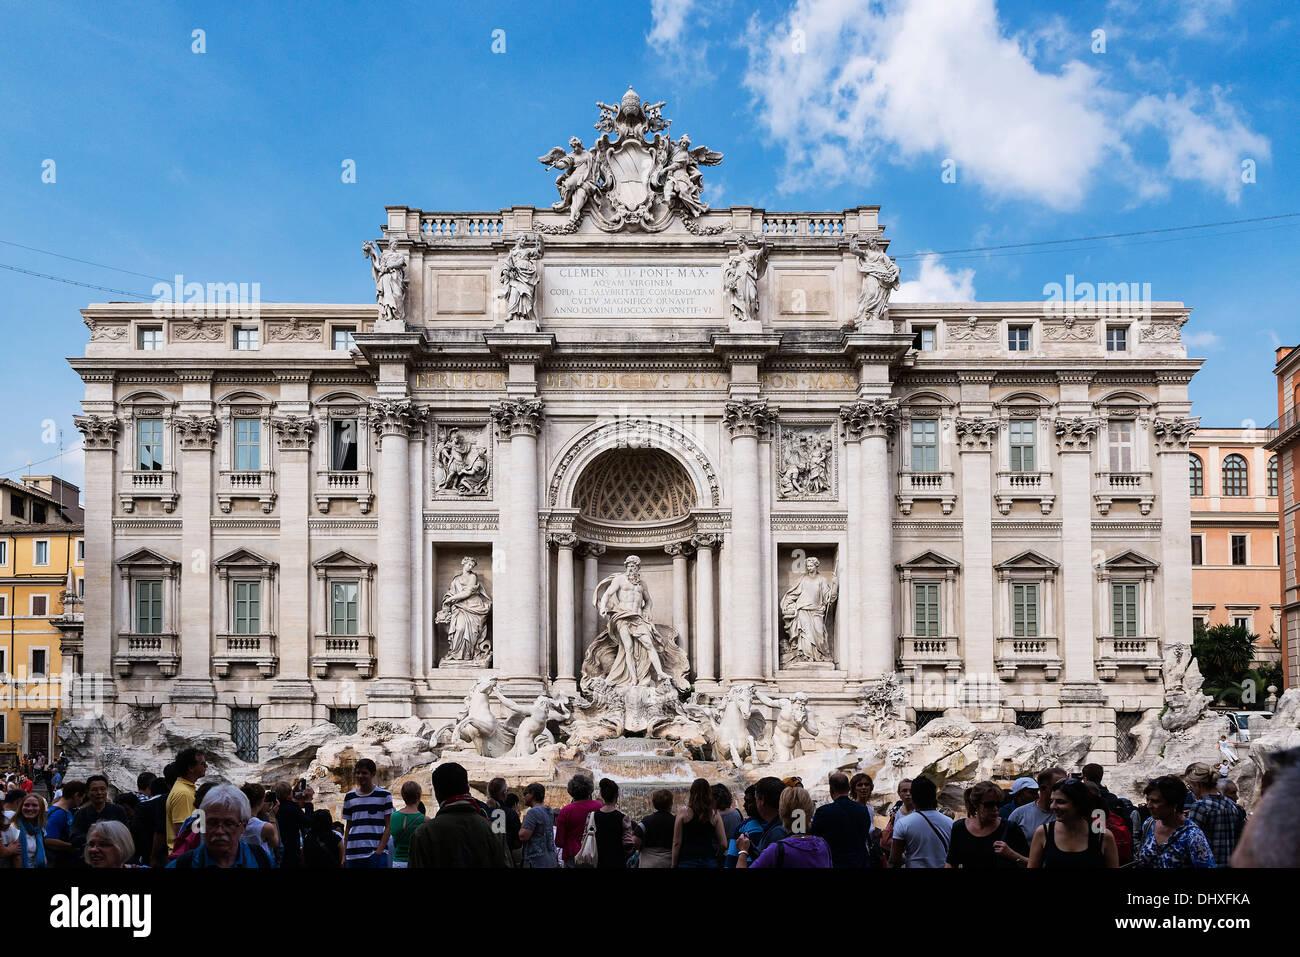 Touristen sammeln der Trevi-Brunnen in Rom, Italien zu bewundern. Stockbild